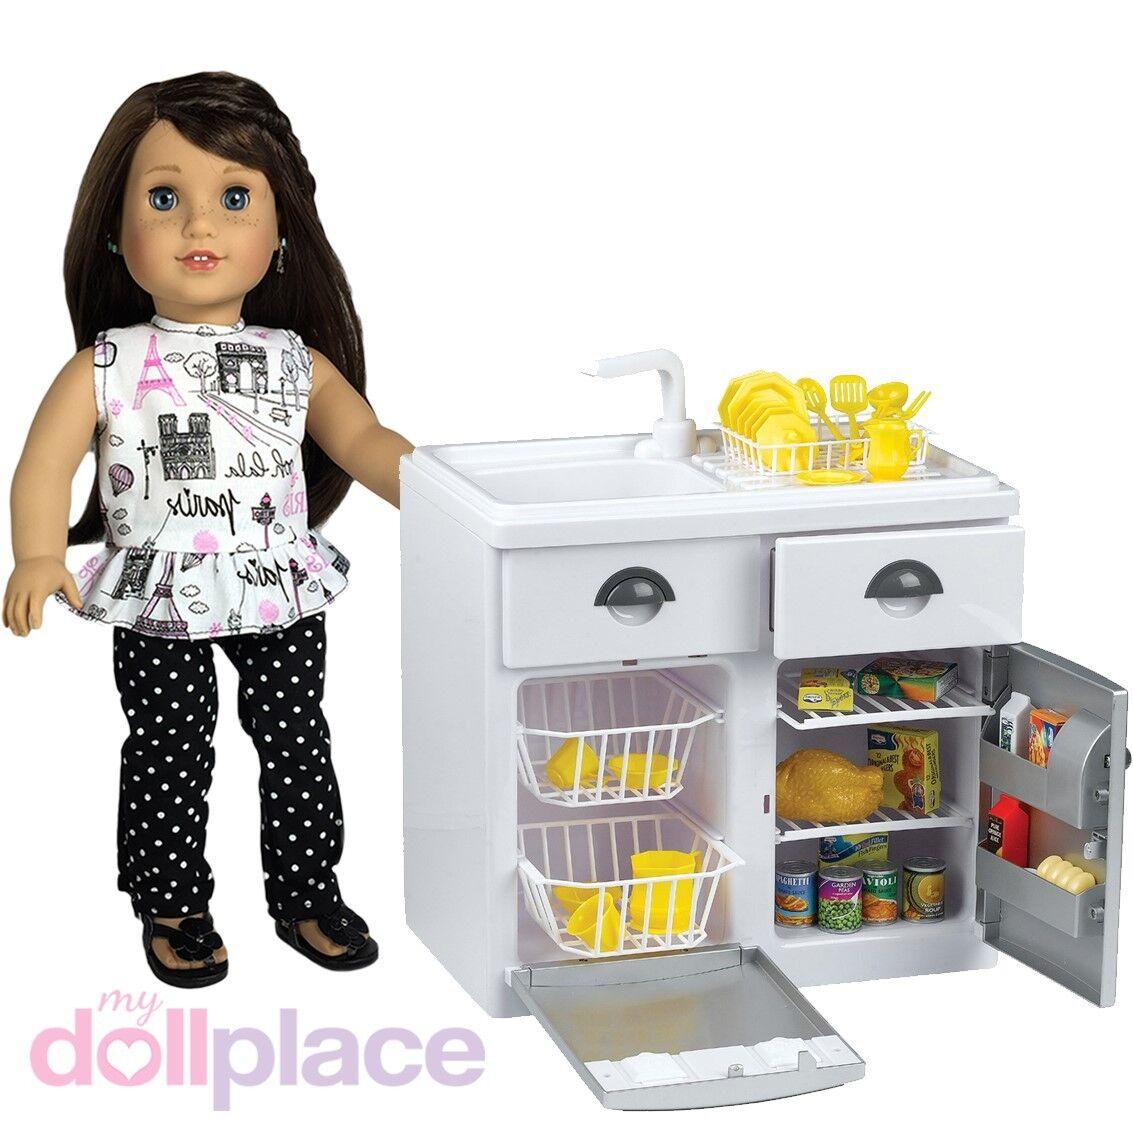 18 inch doll sink dishwasher fridge food kitchen furniture